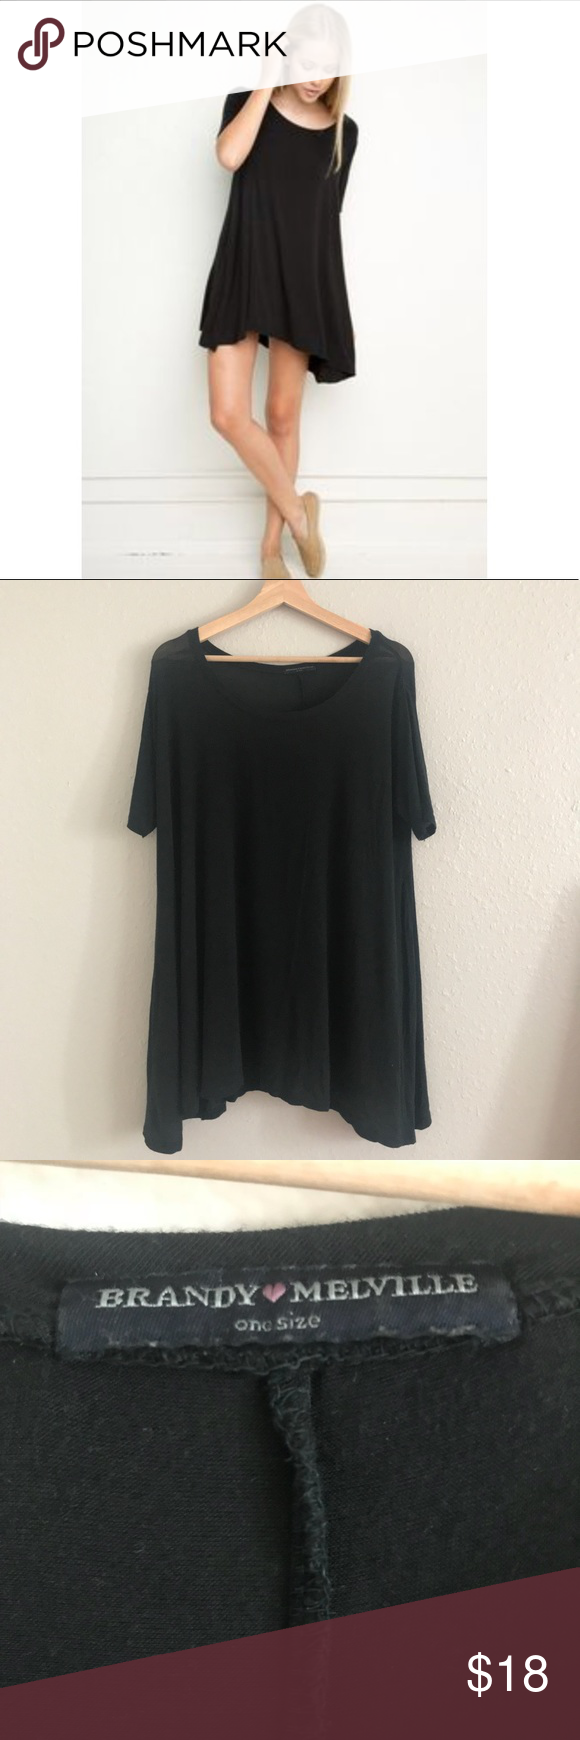 Brandy melville short sleeve tshirt dress my posh picks